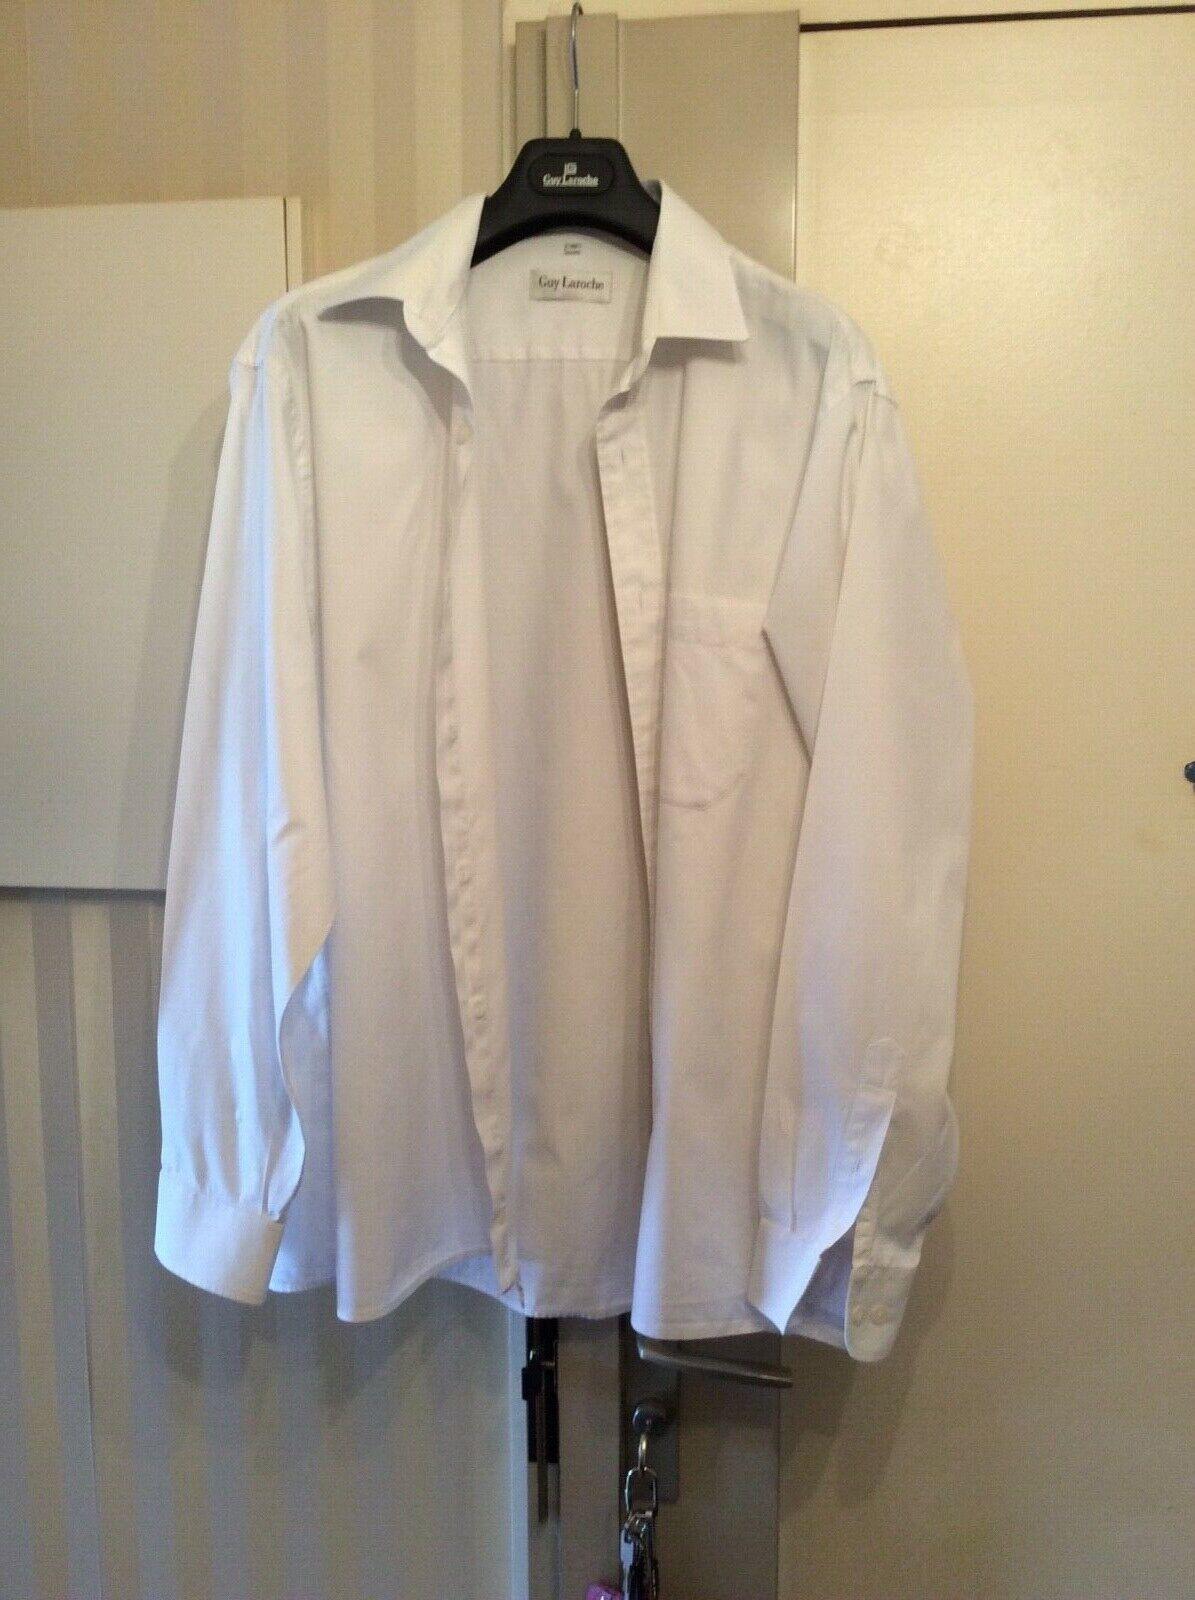 Chemise blanche guy laroche